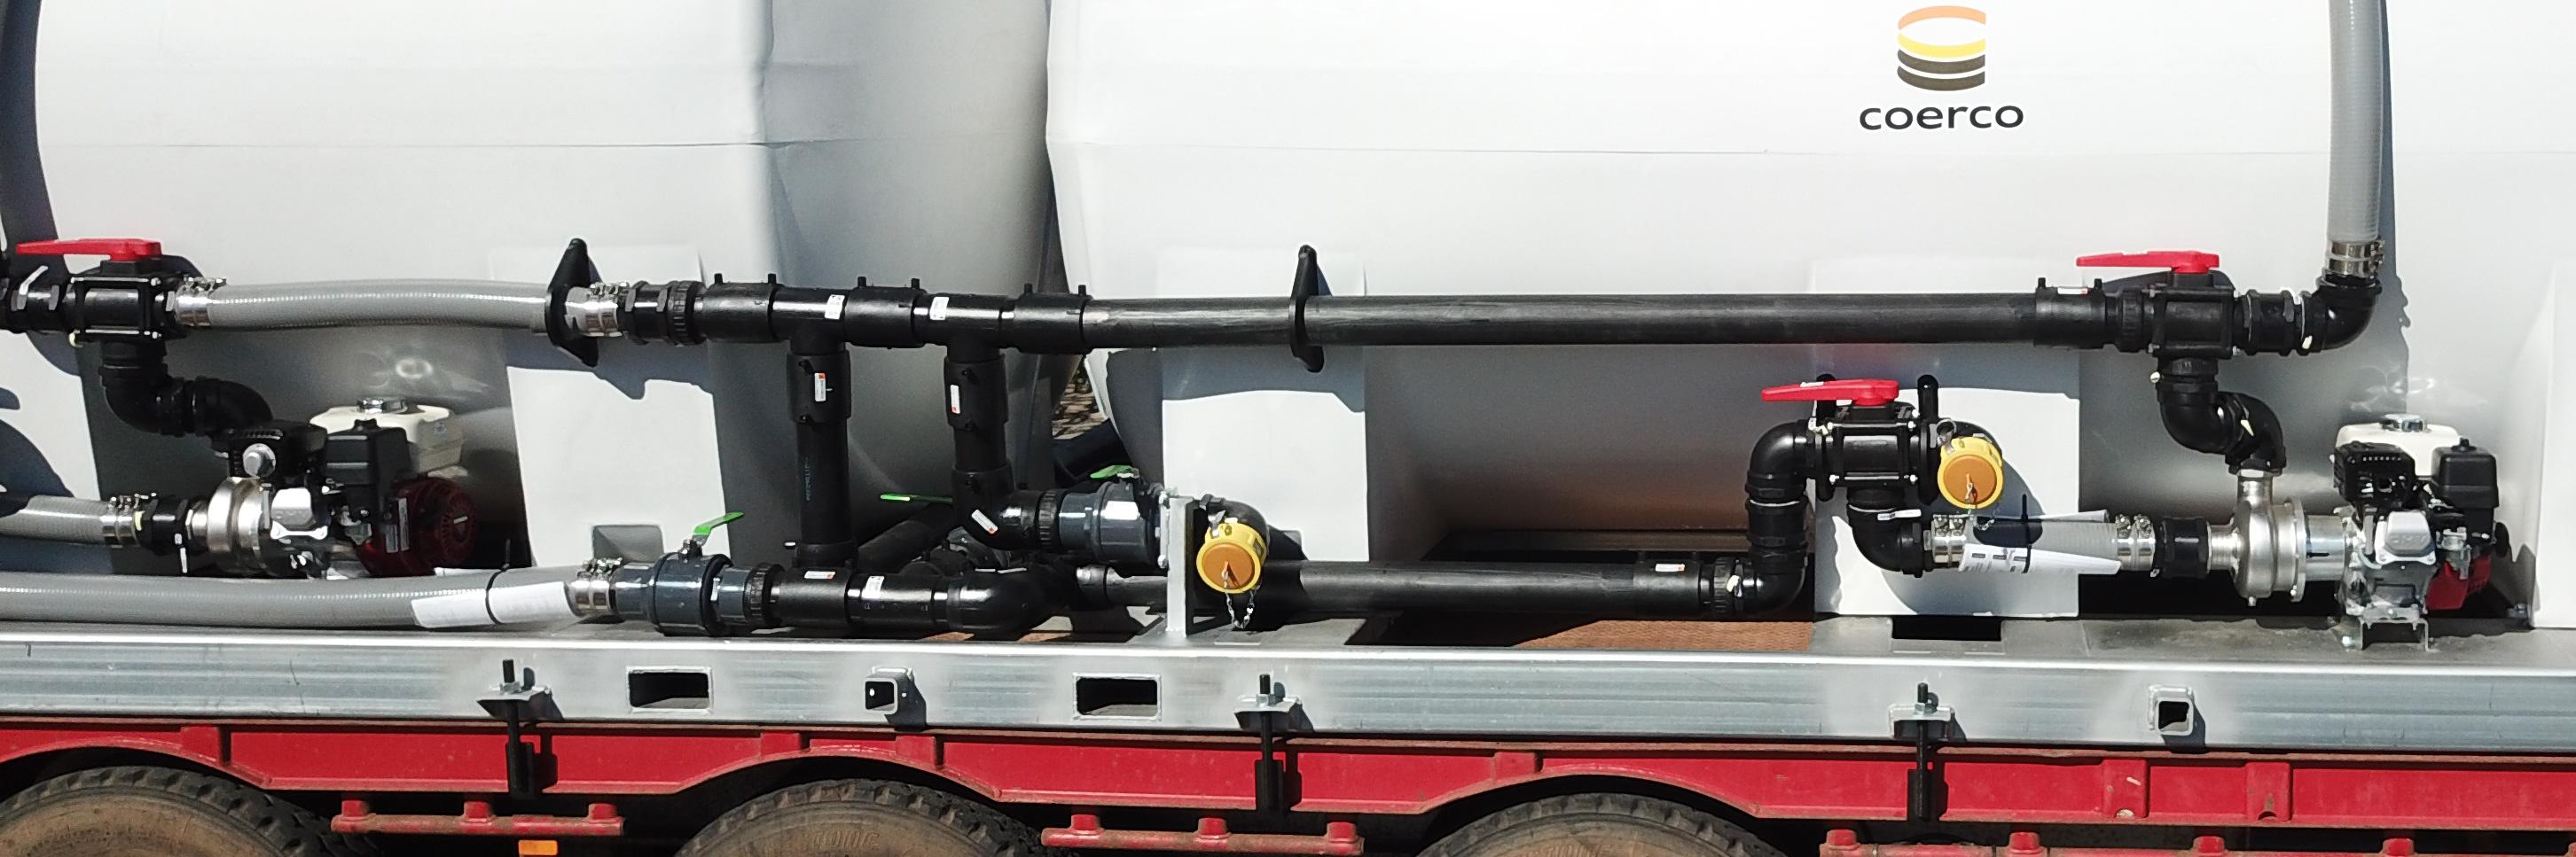 Coerco 3 inch Pump & Pipe Setup